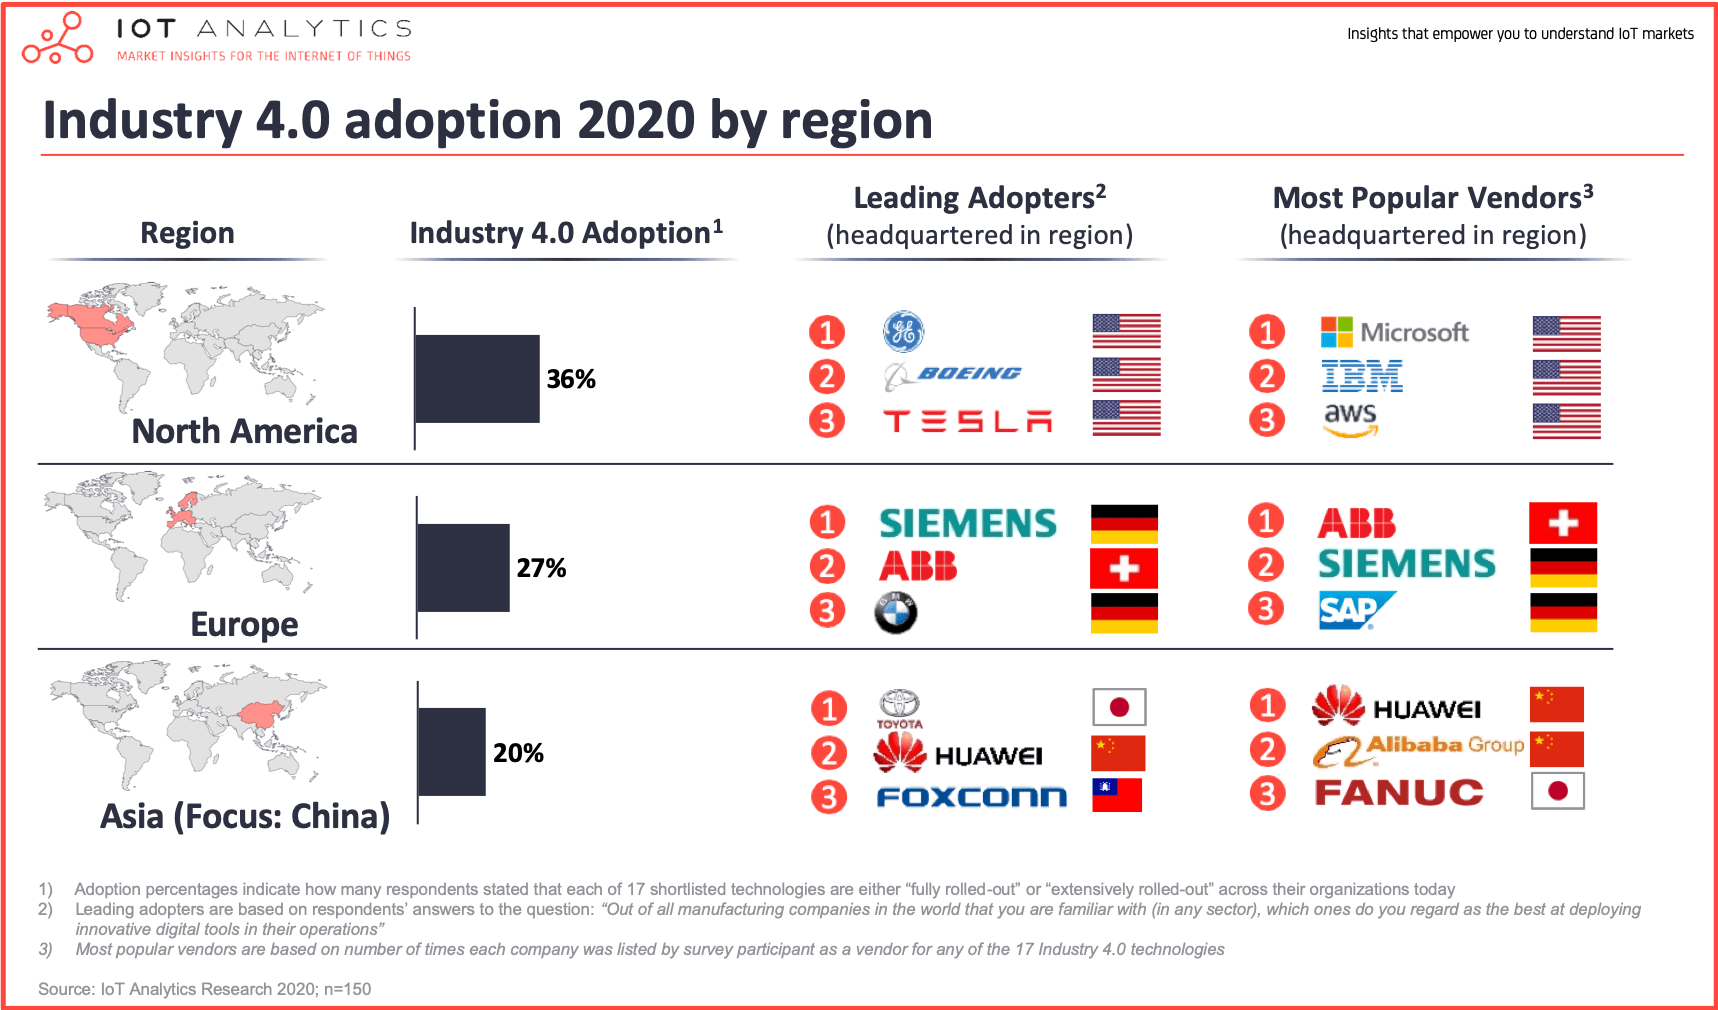 Industry 4.0 adoption 2020 by region